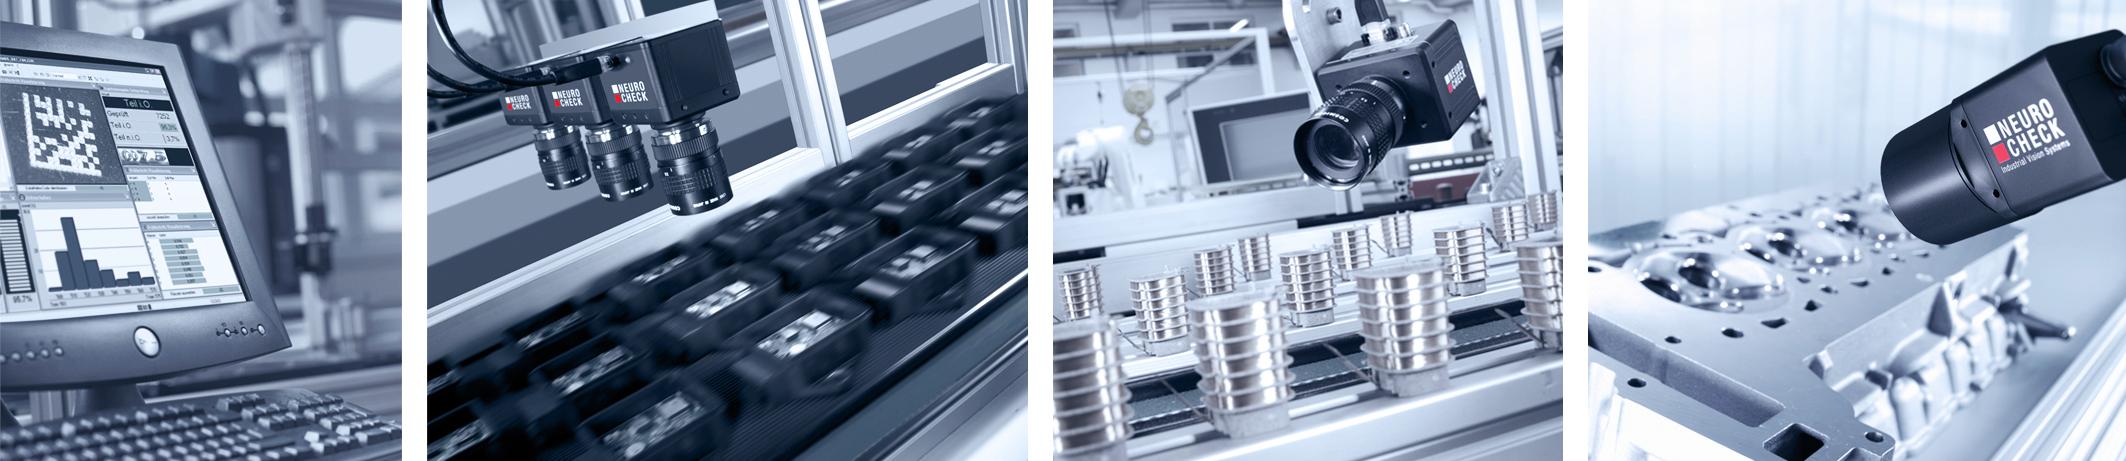 NeuroCheck Unternehmen in Remseck (Foto © NeuroCheck)